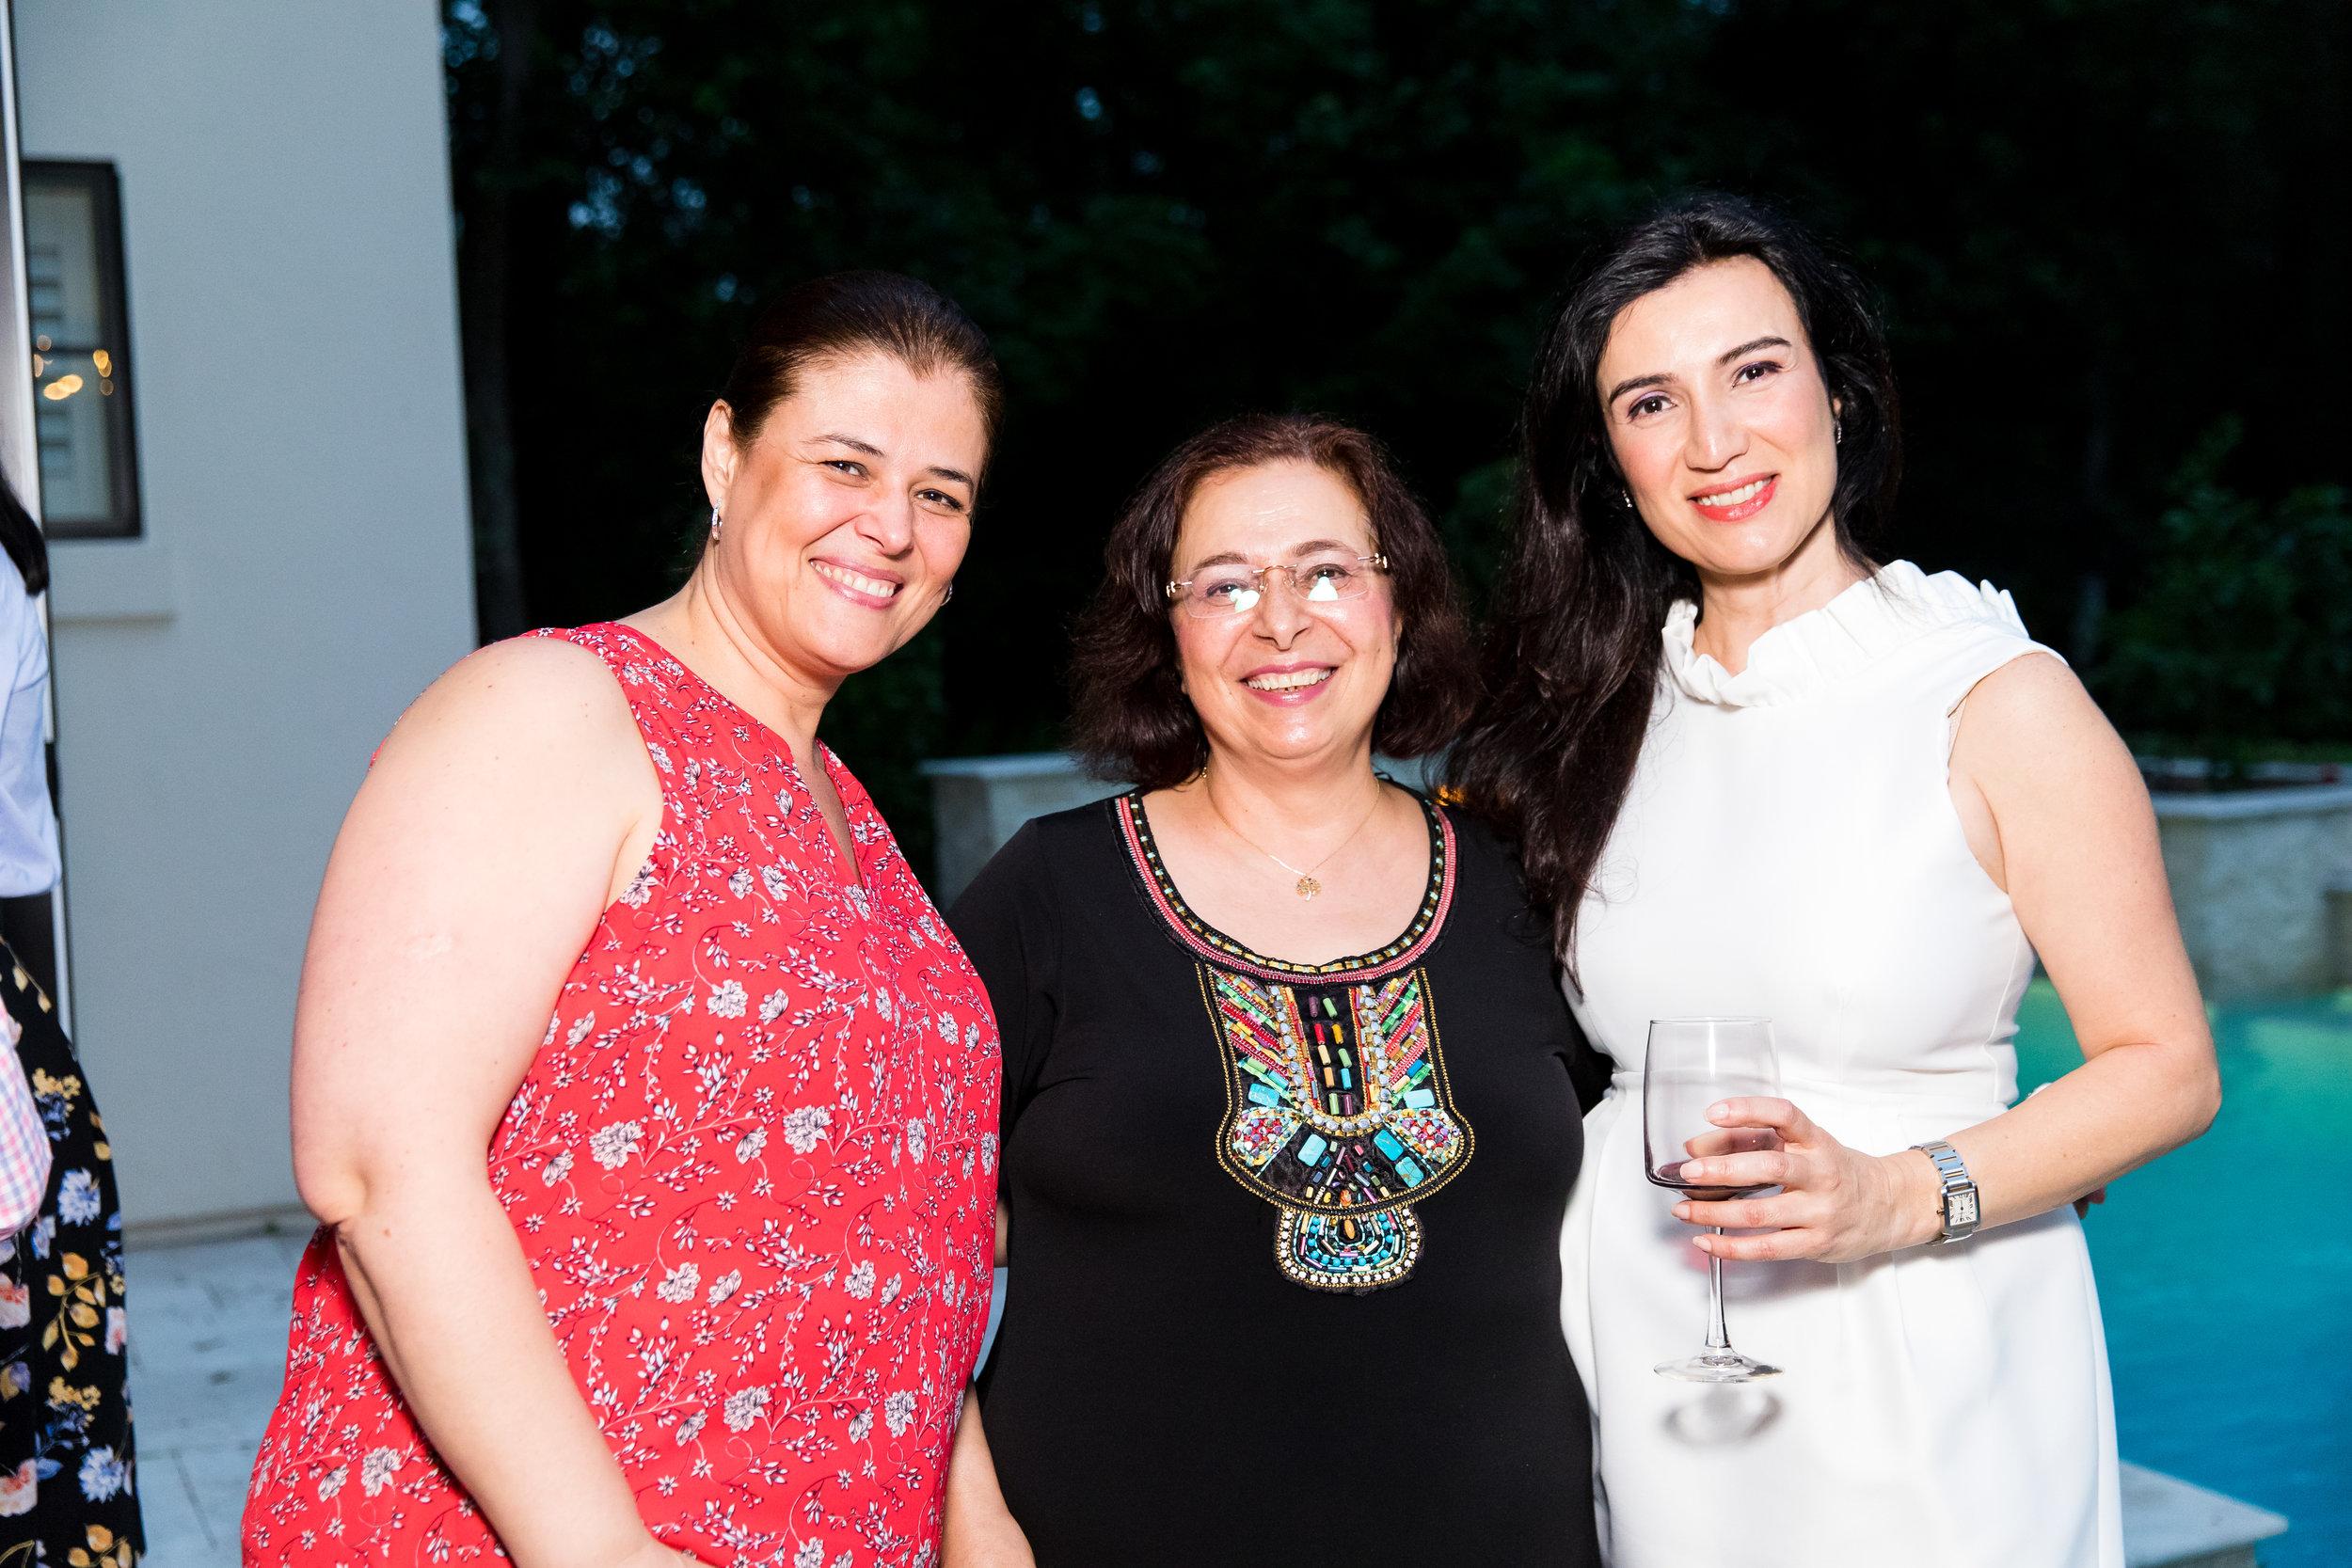 20180421-3rd Annual Education Women Turkey-316.jpg